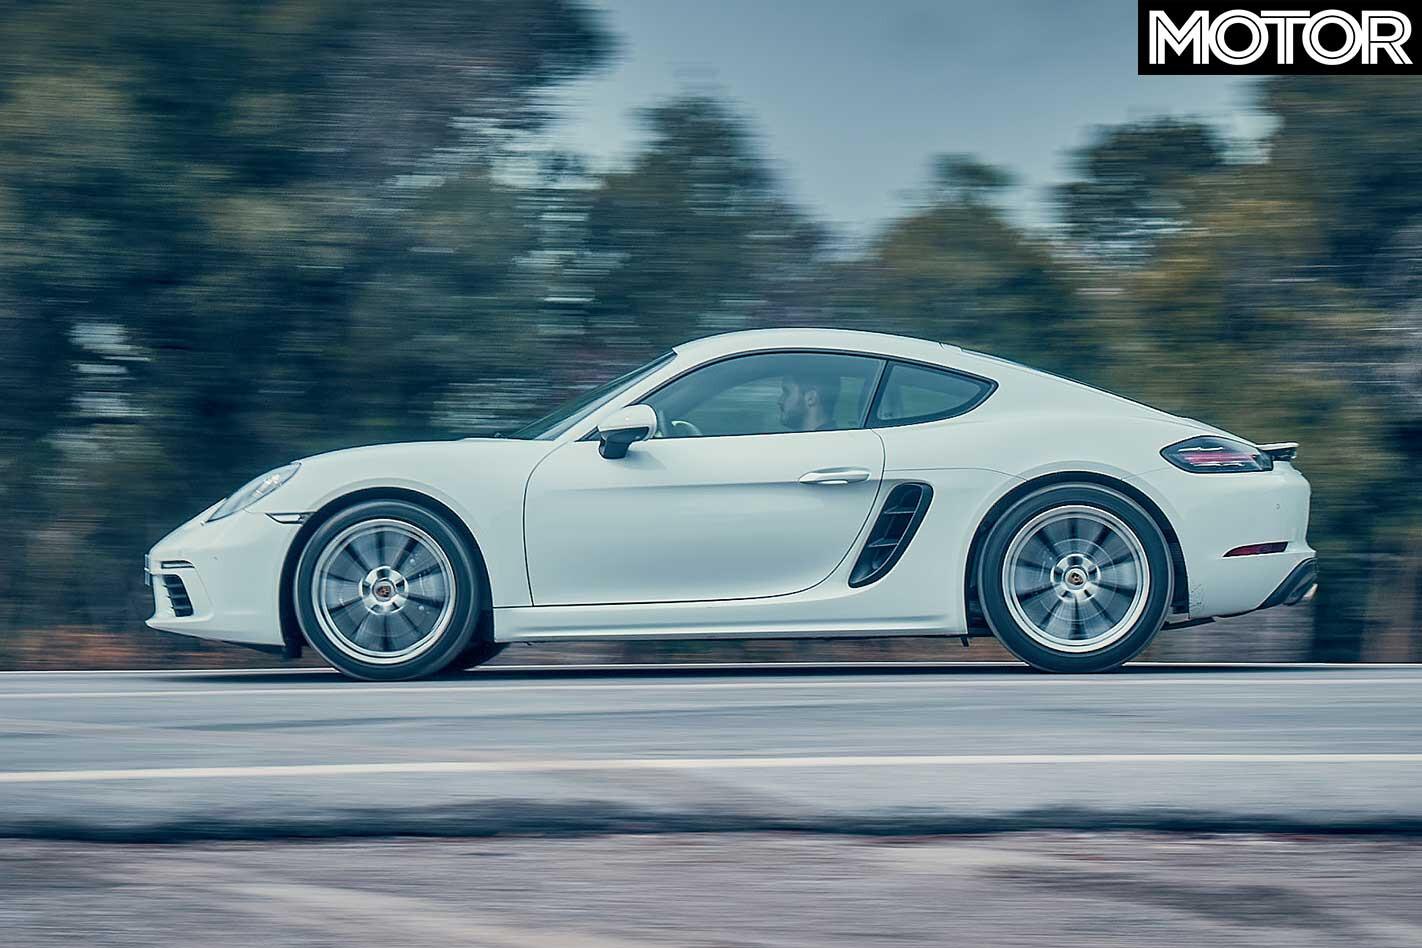 2018 Porsche 718 Cayman Side Profile Dynamic Jpg